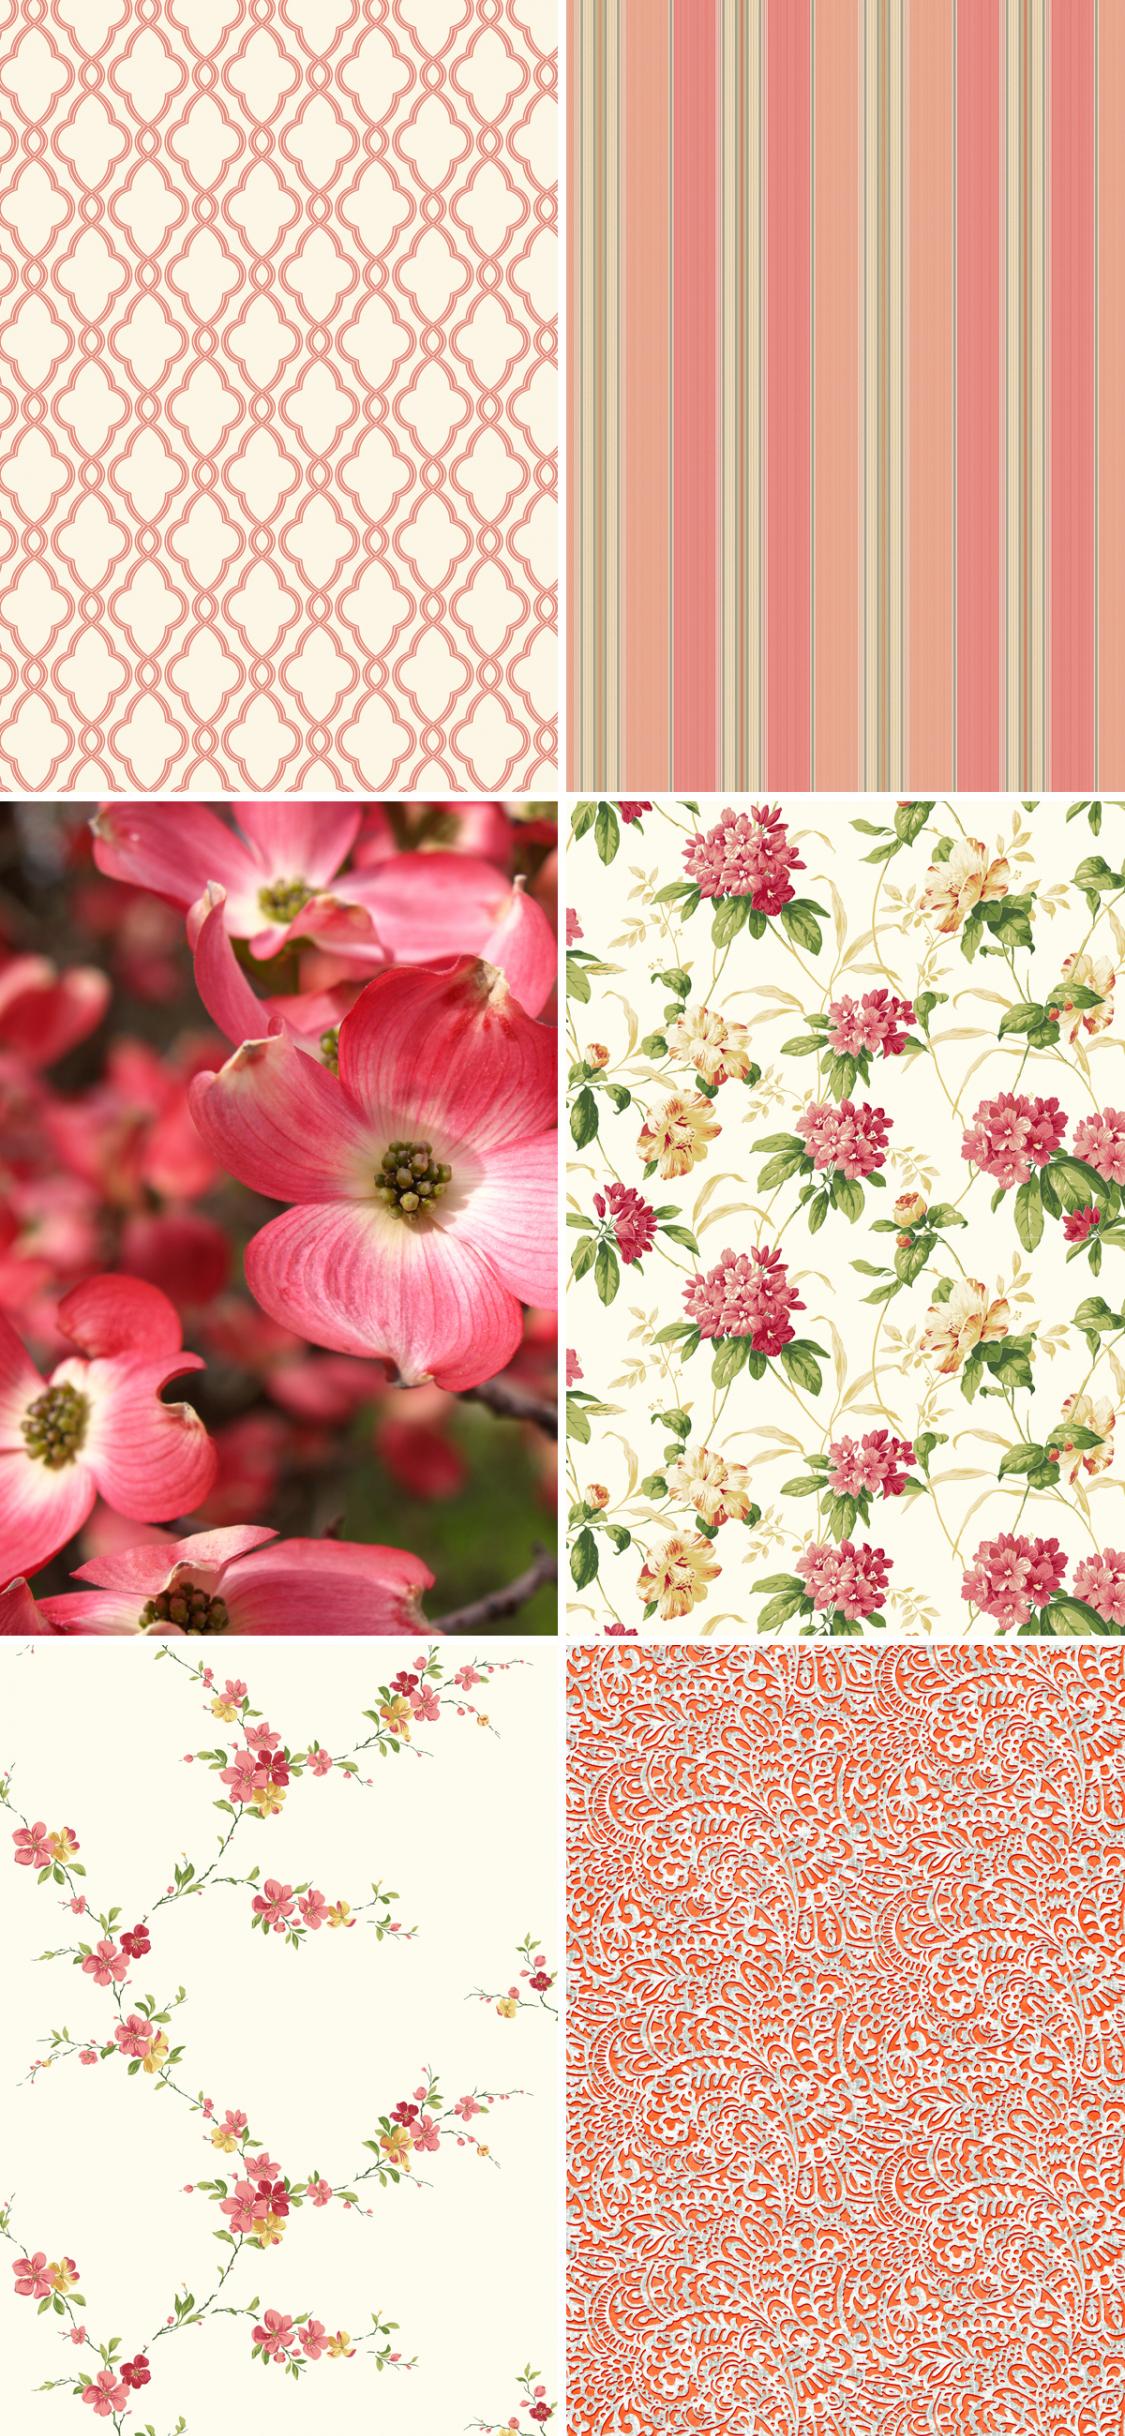 Free Download New Waverly 5507640 Floral Trail Wallpaper Bunda